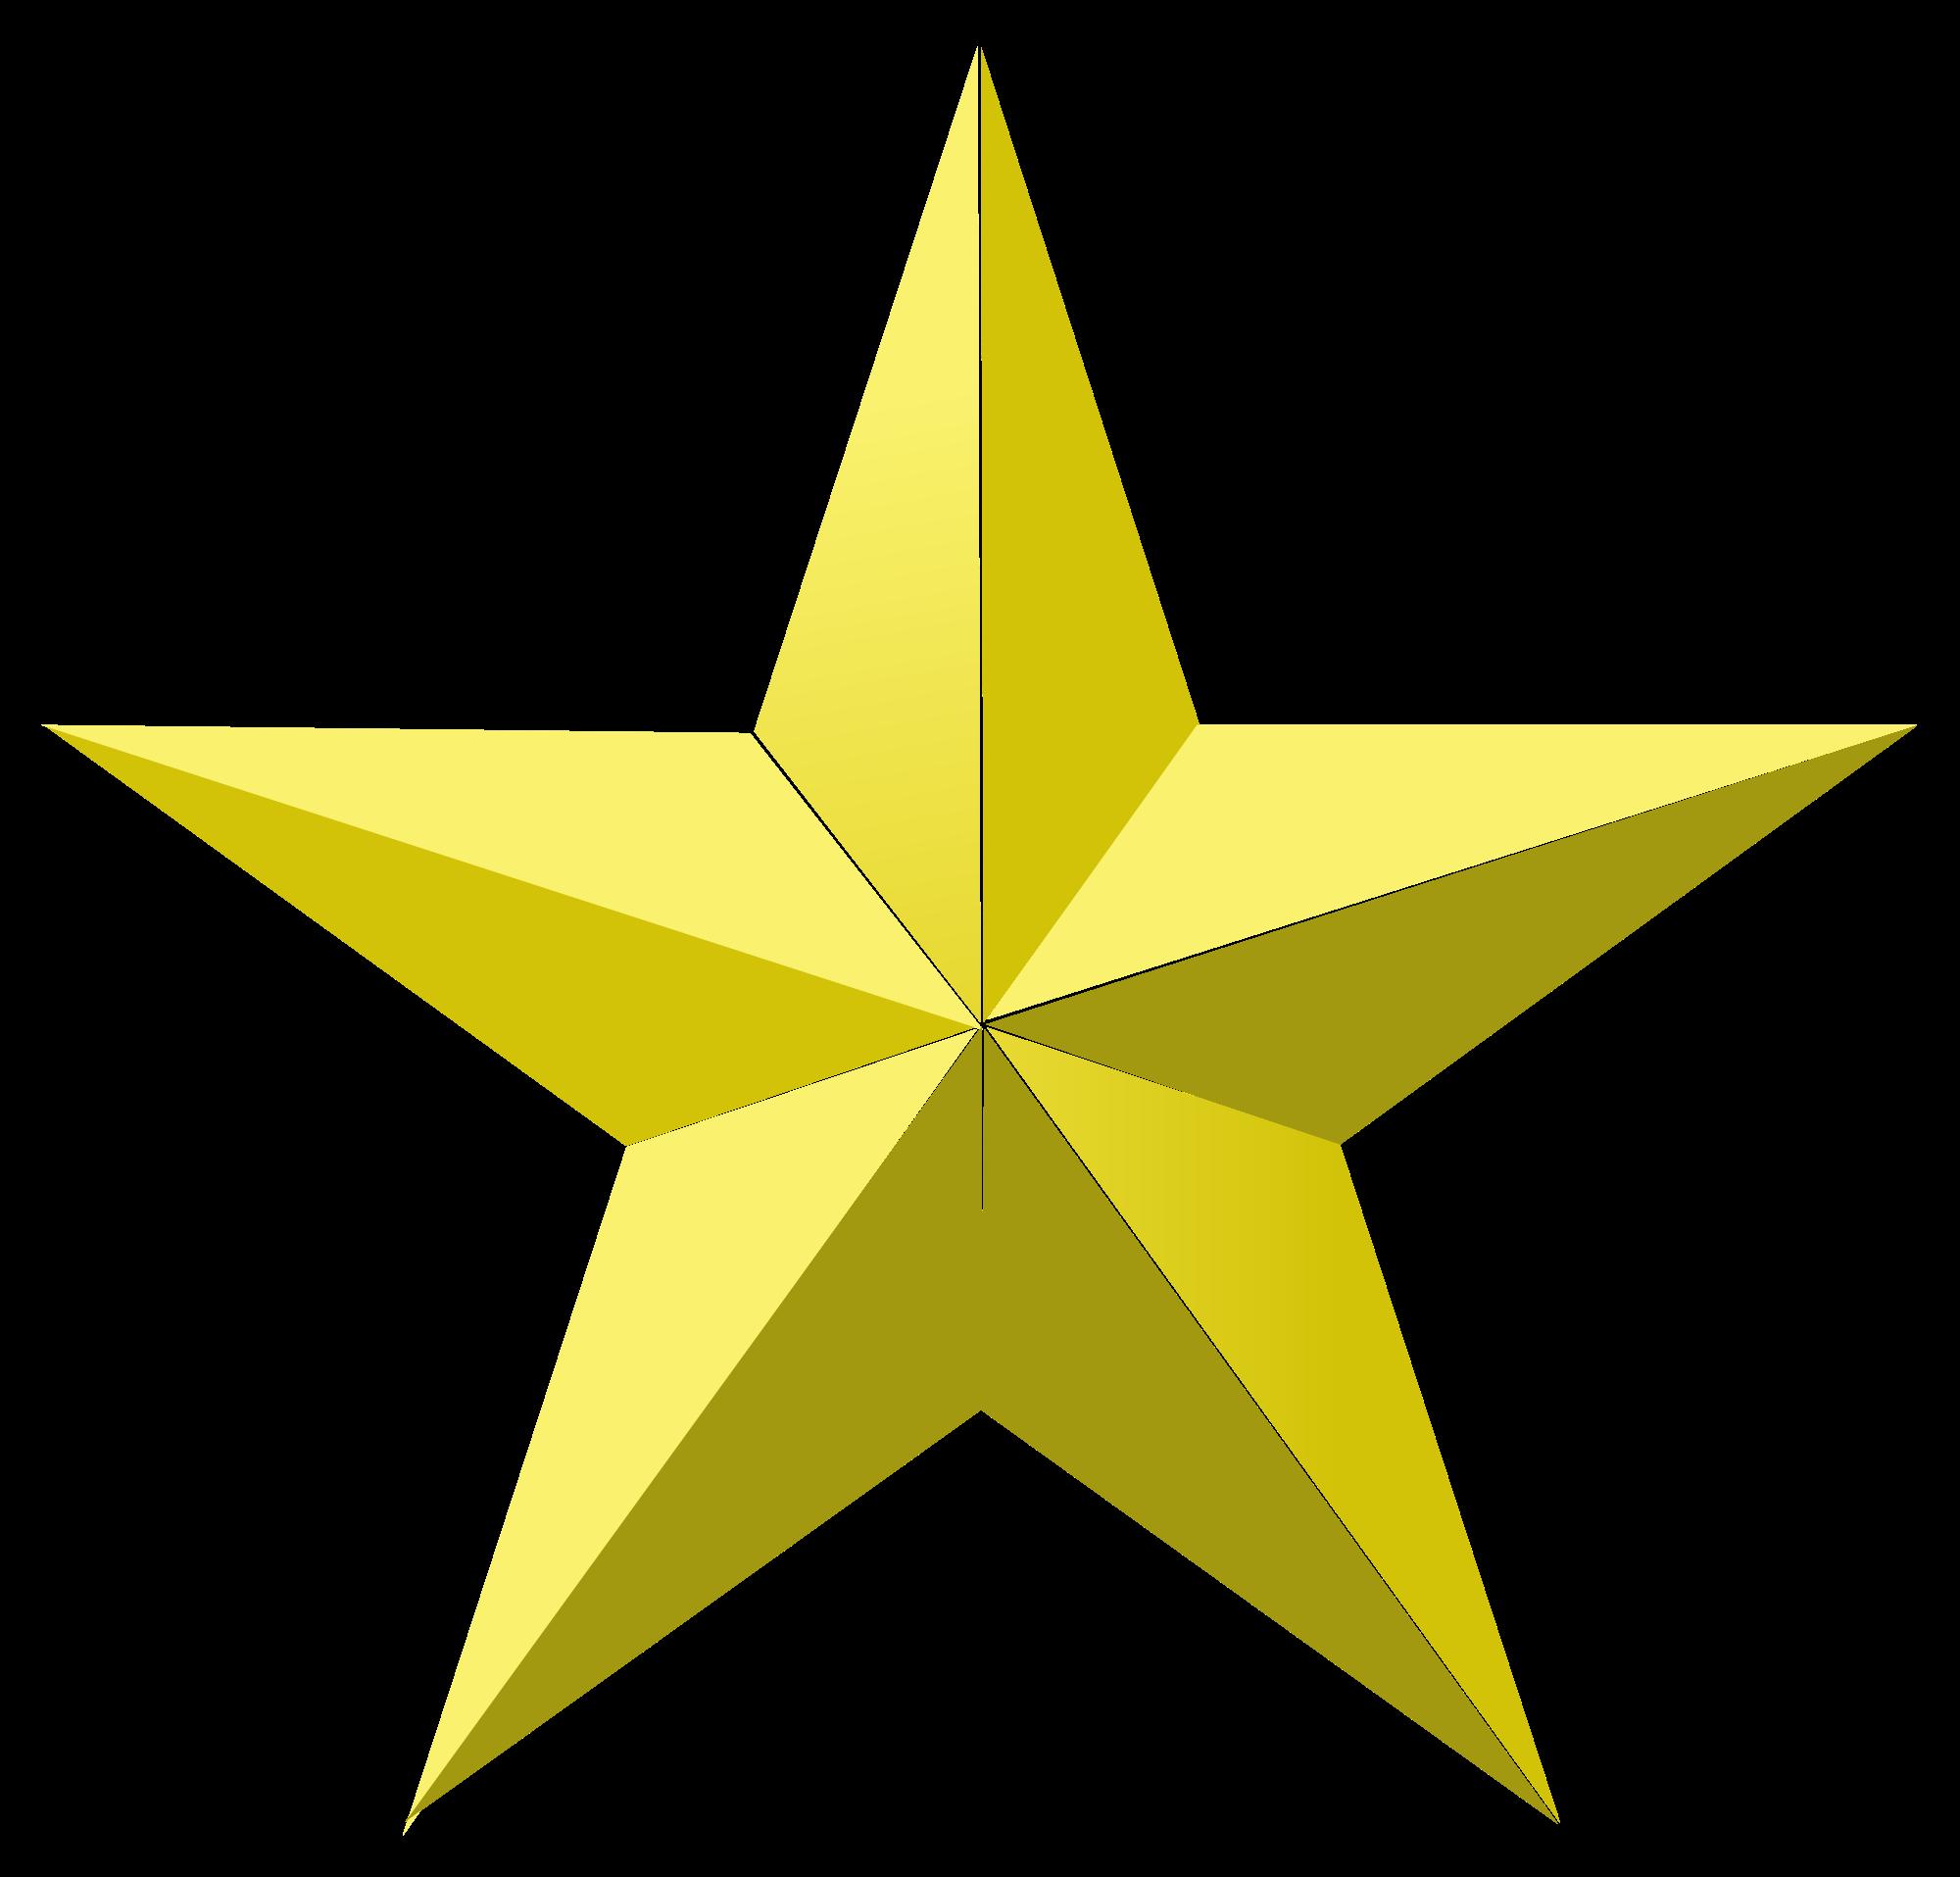 Gold Star Png Image Gold Stars Stars Pretty Phone Wallpaper